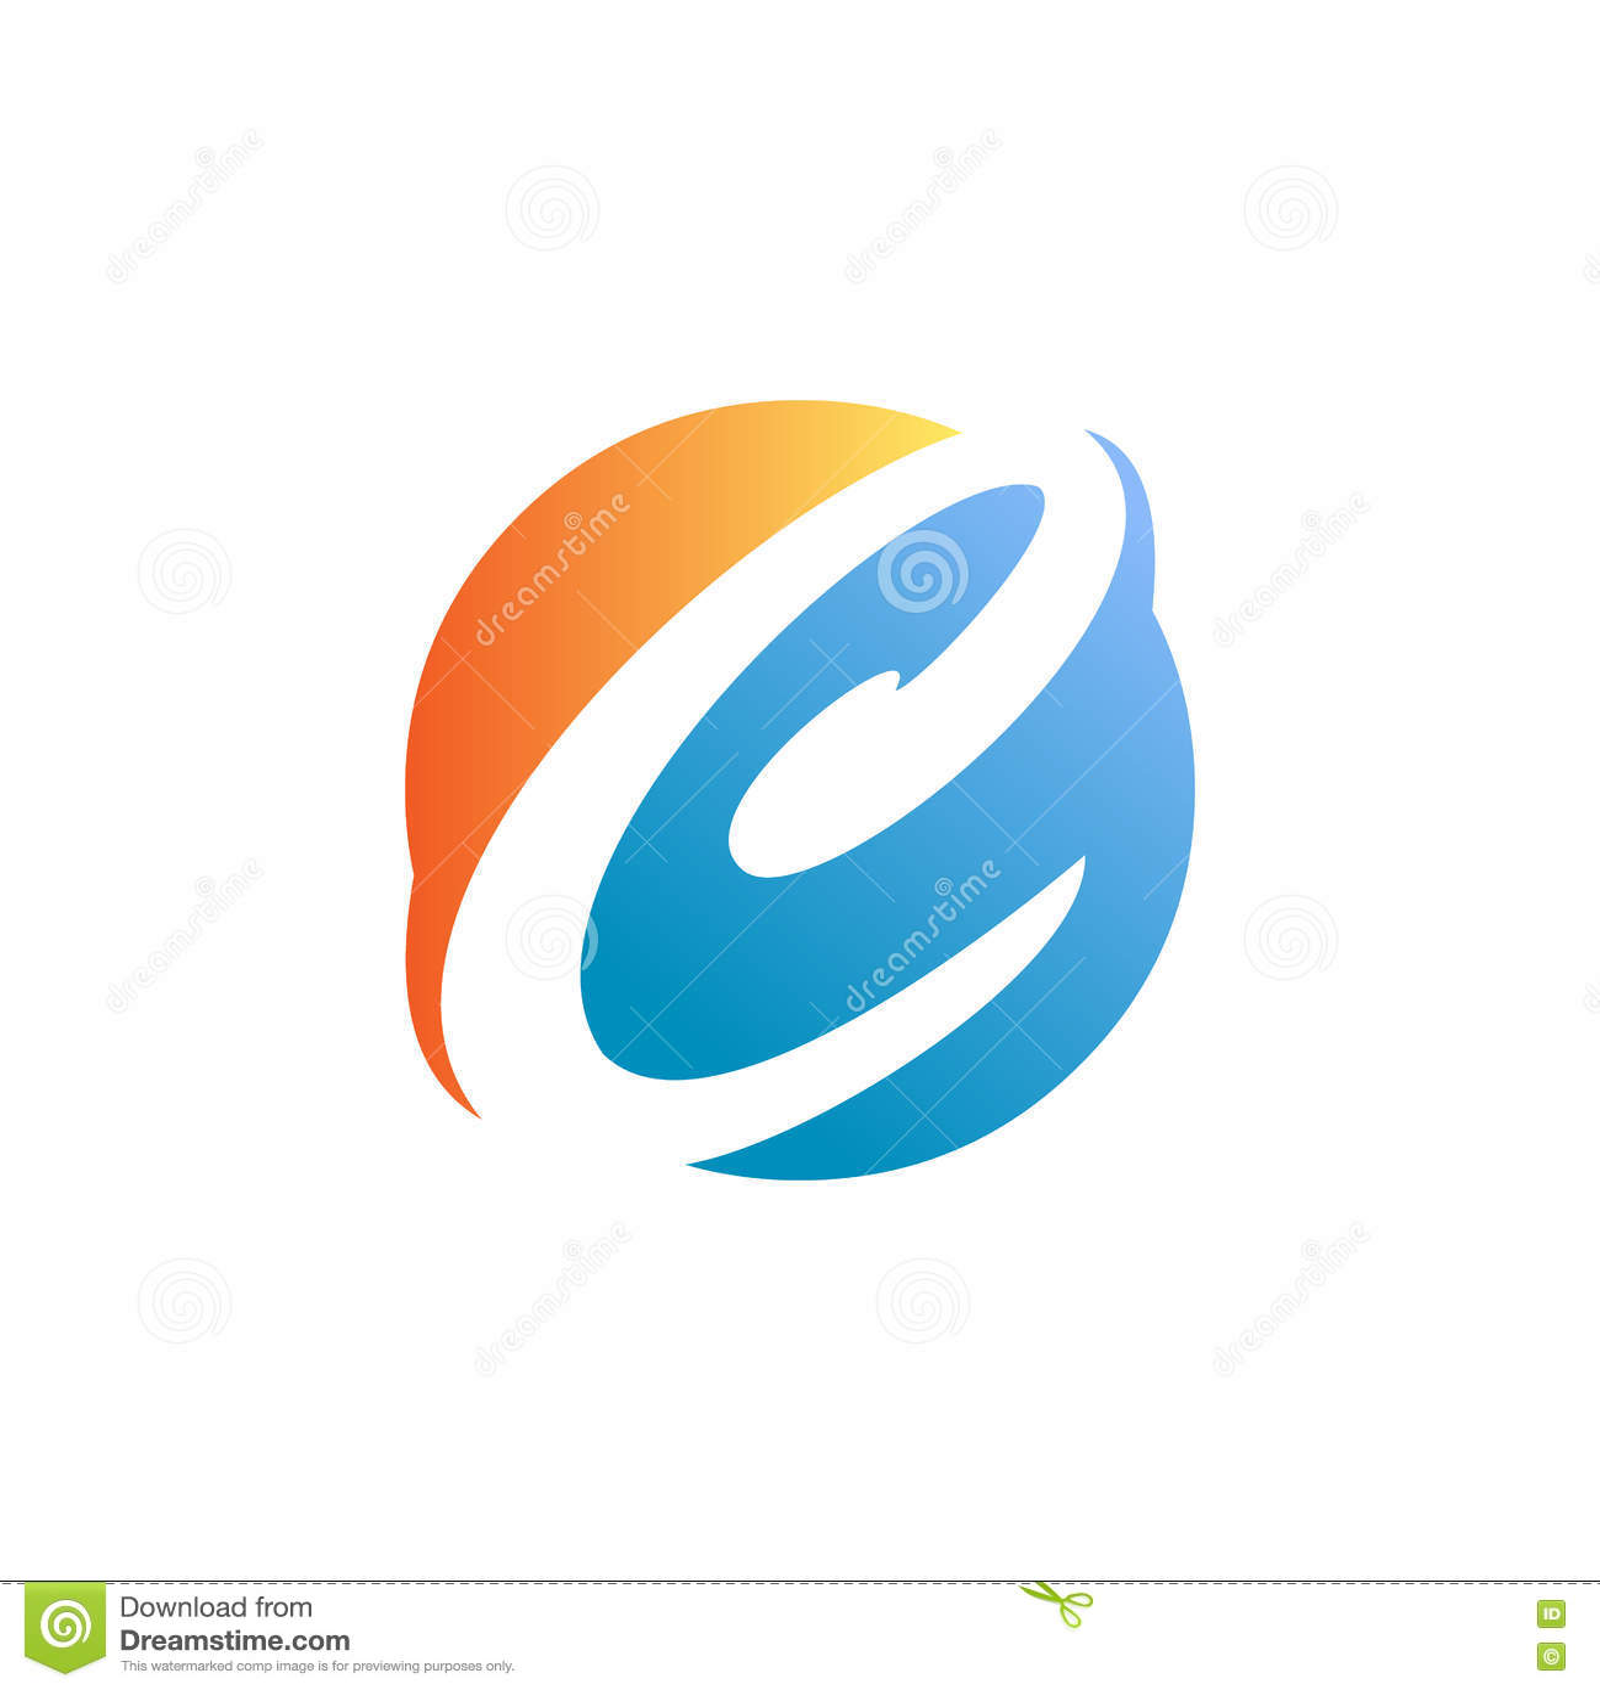 Stylish letter c symbol creative design stock vector illustration stylish letter c symbol creative design biocorpaavc Images